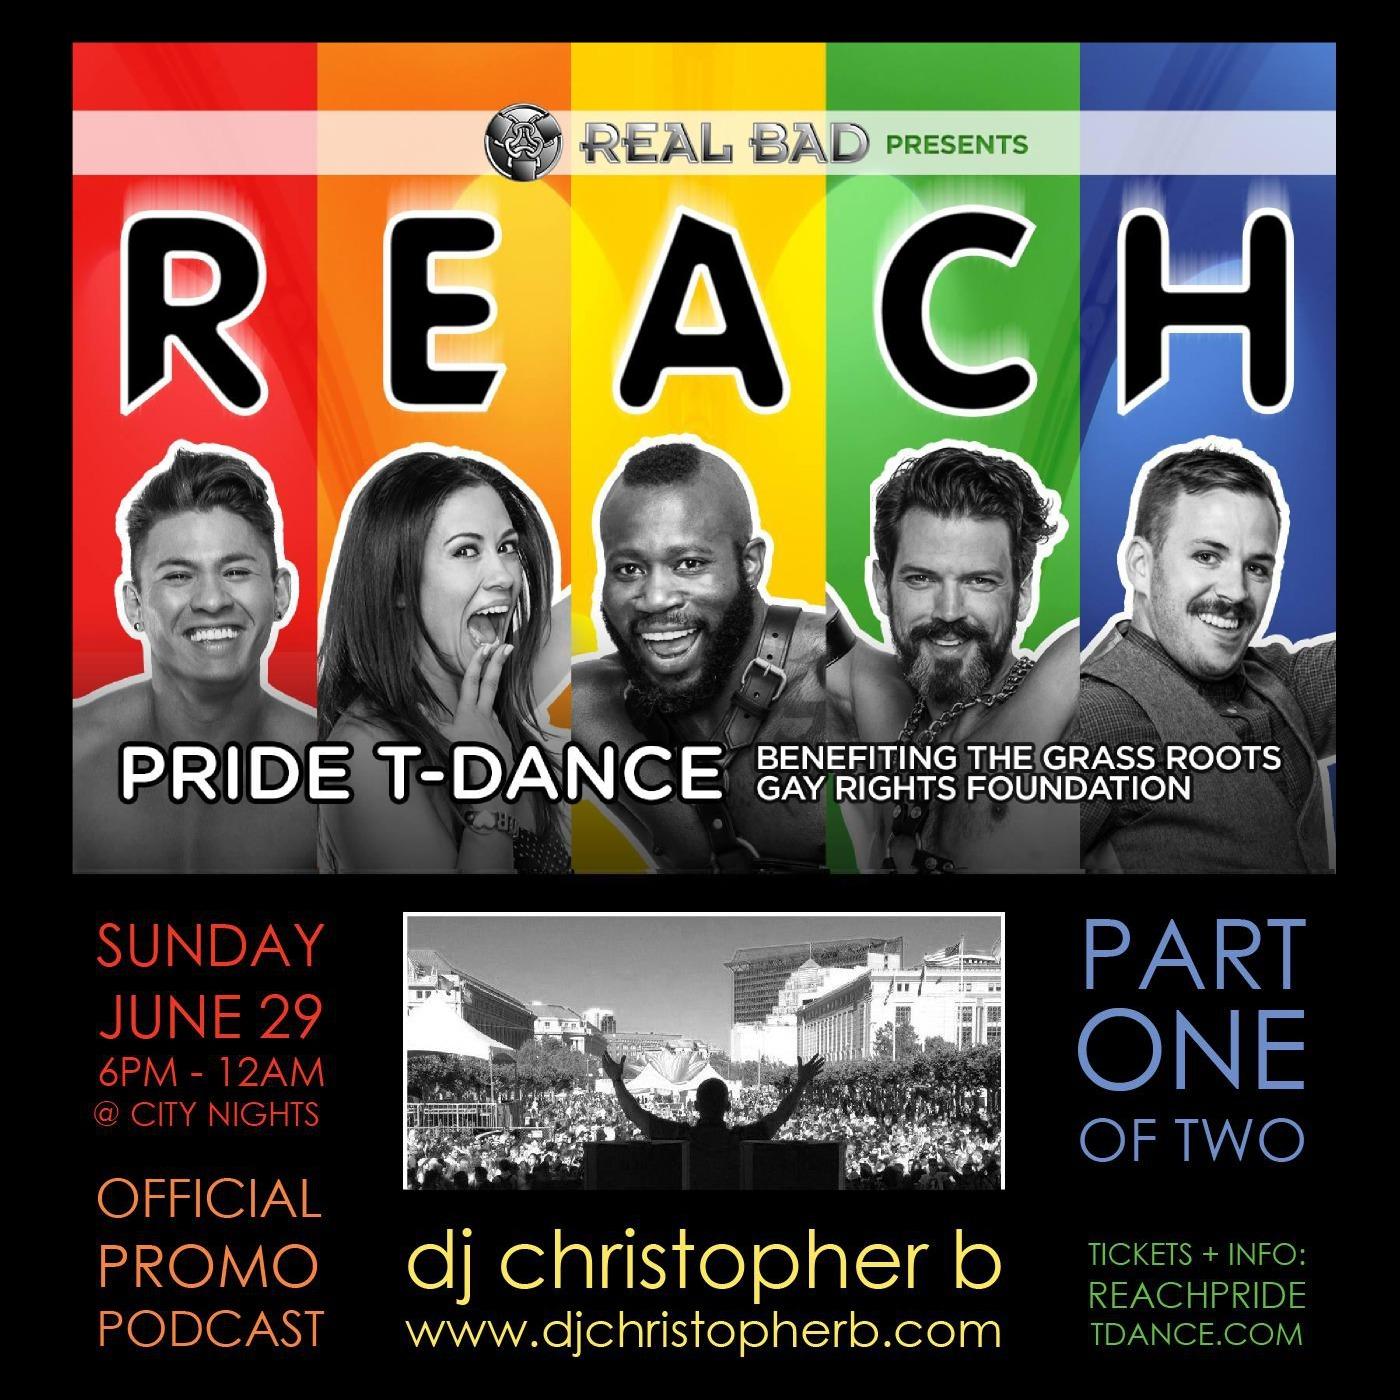 REACH / Part One - Dj Christopher B (podcast)